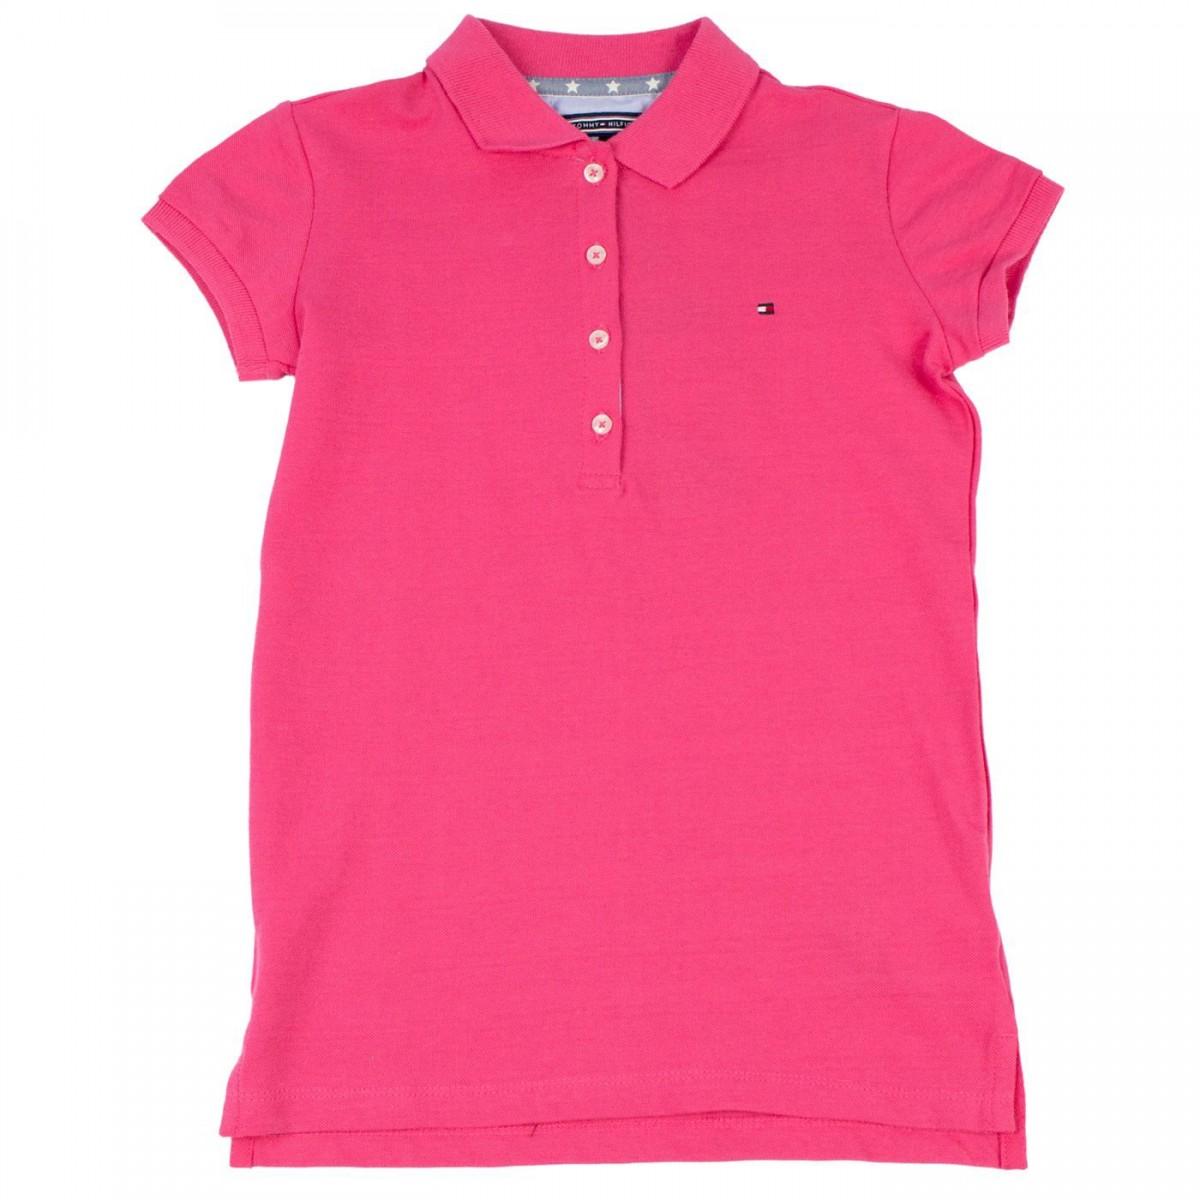 05d377cdbe Bizz Store - Camisa Polo Infantil Feminina Tommy Hilfiger